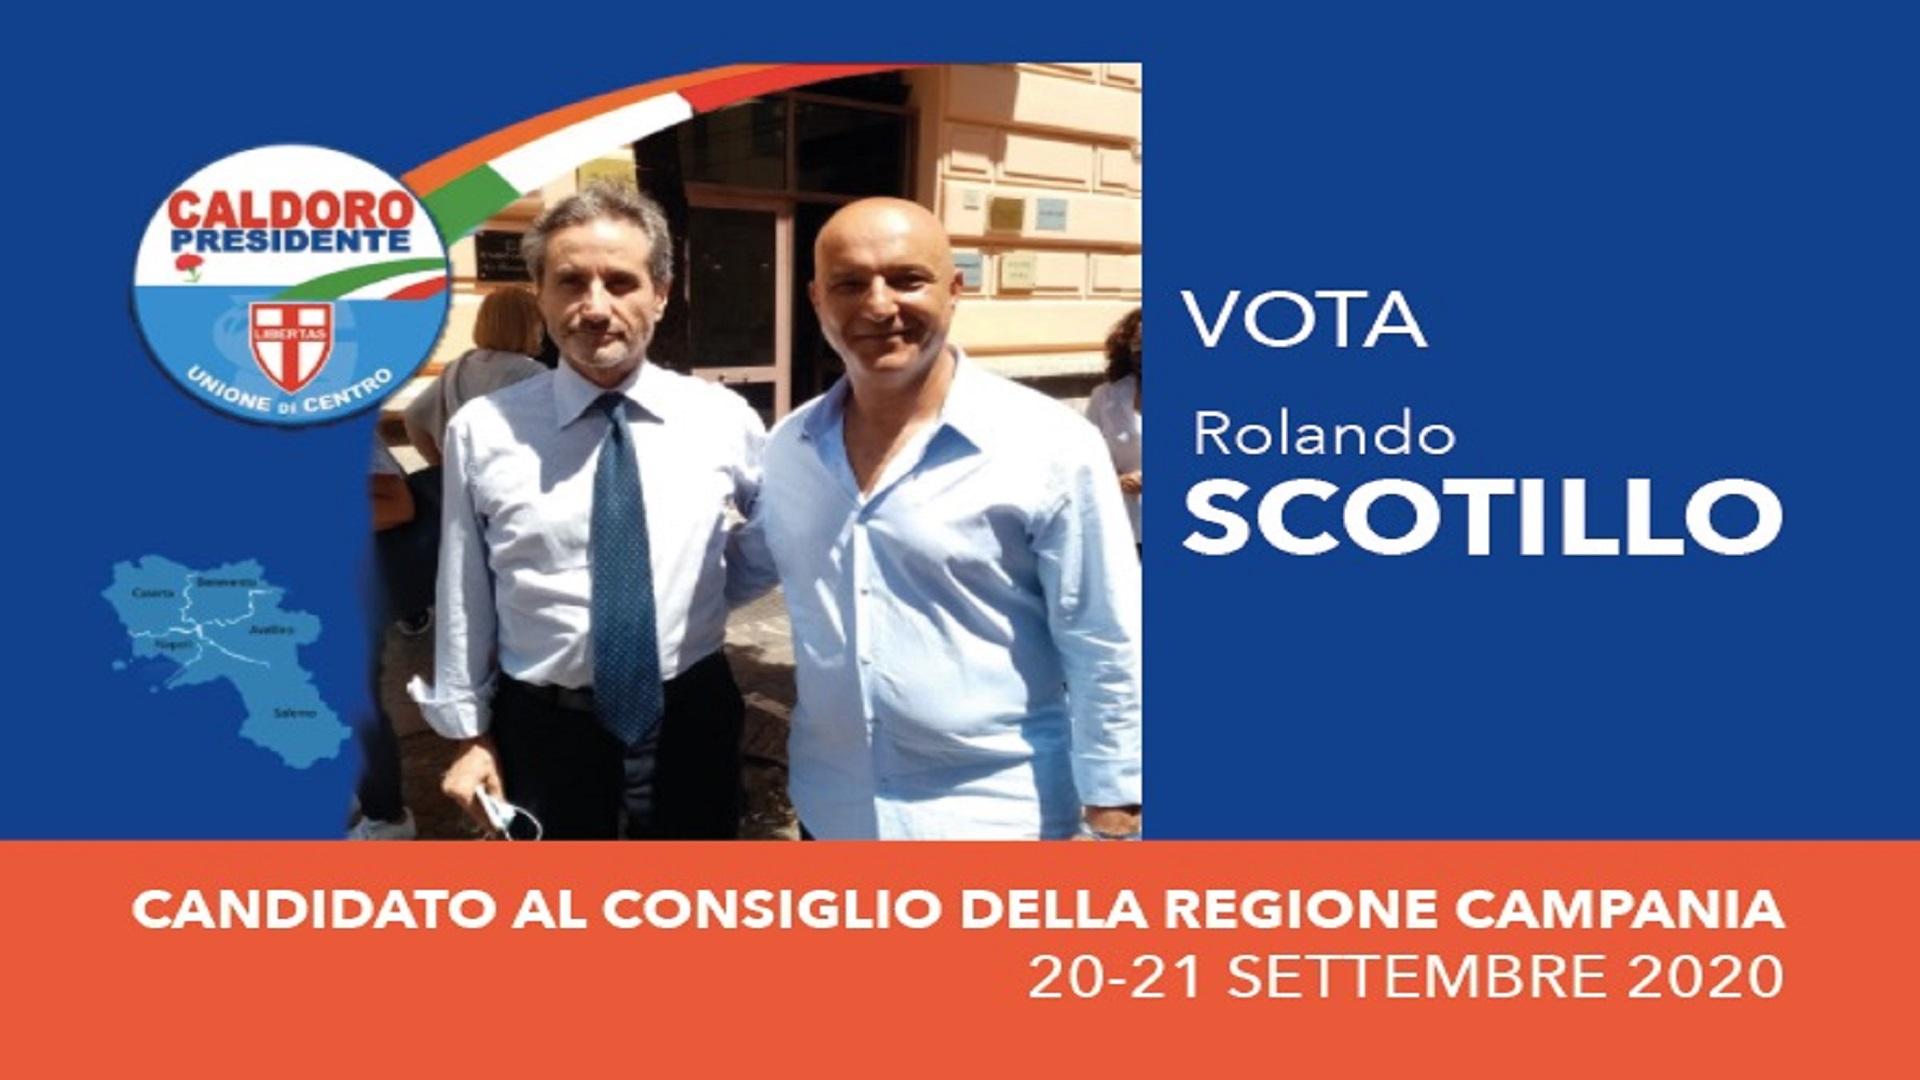 ROLANDO SCOTILLO COPERTINA